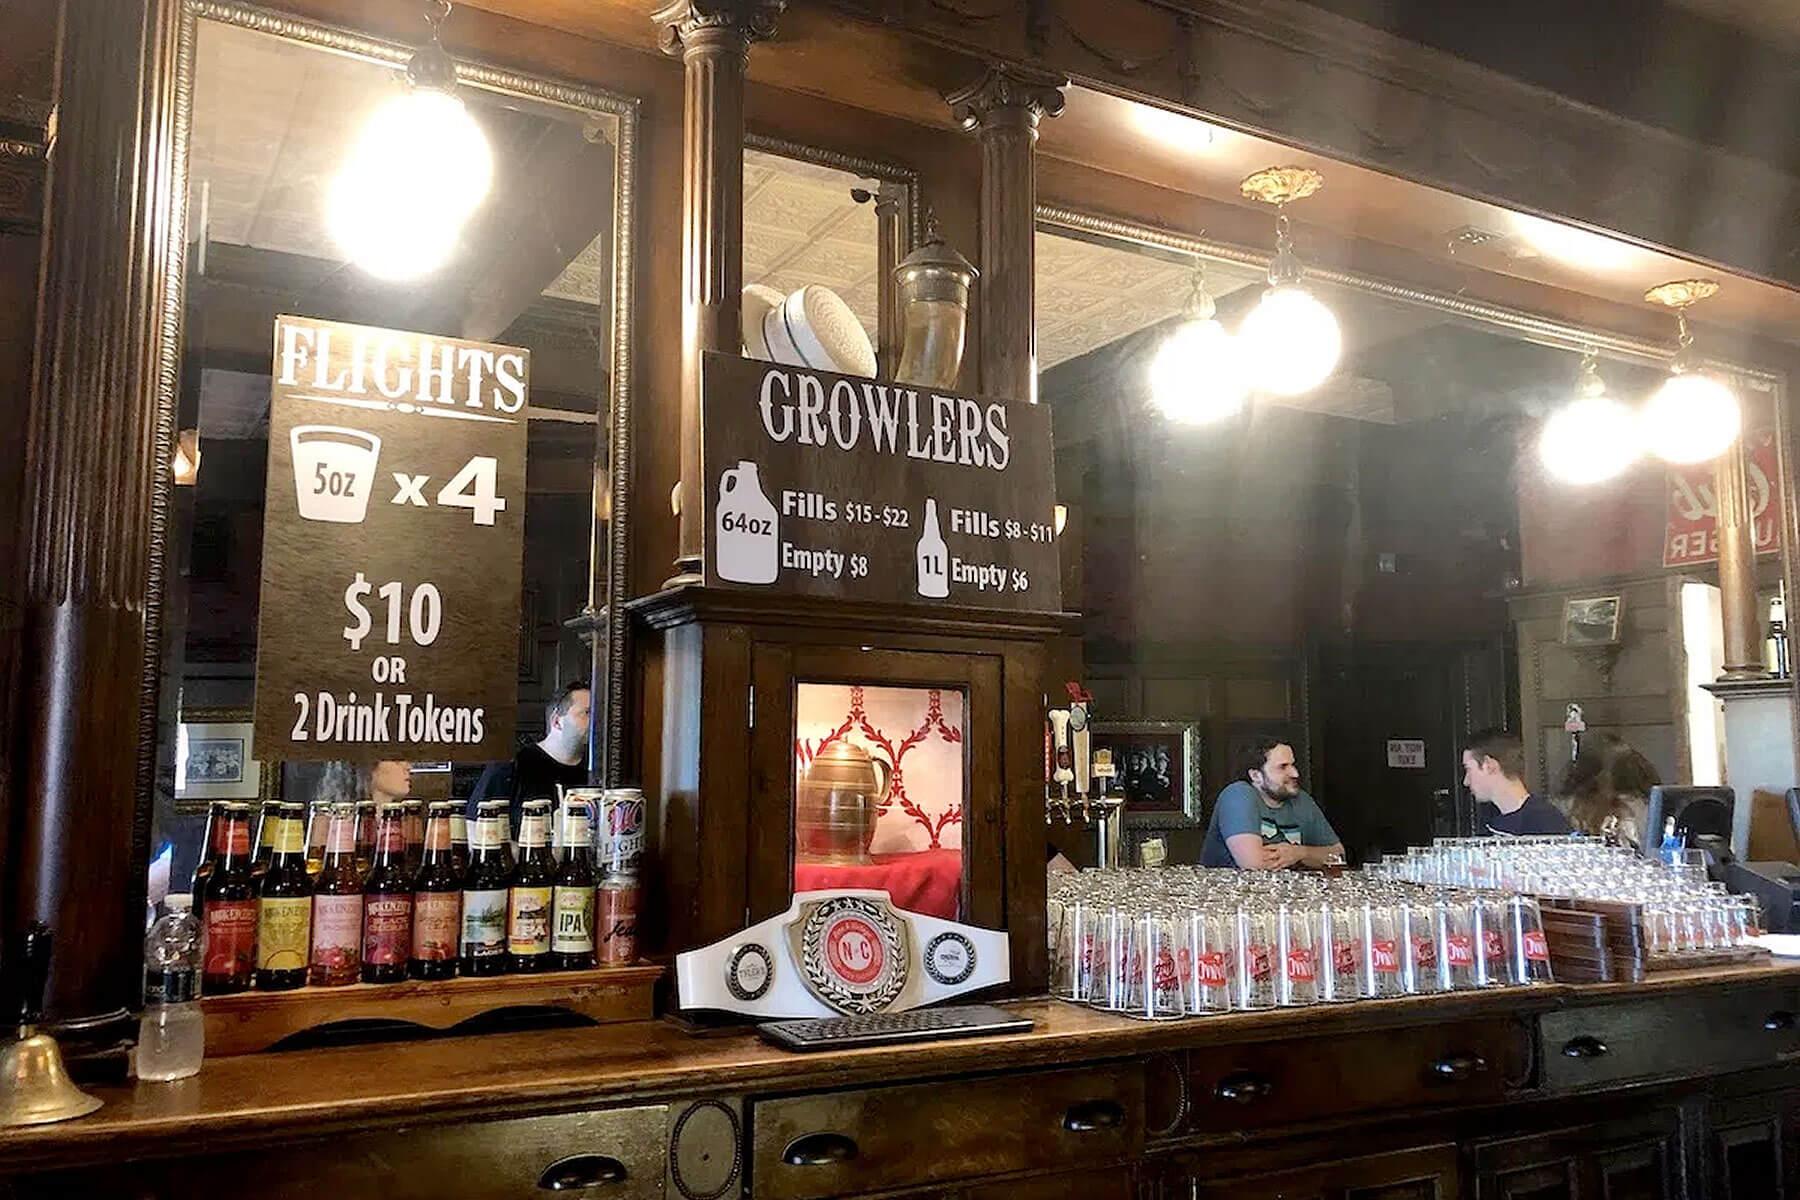 Inside the tasting room at Saranac Brewery (F.X. Matt Brewing Co.) in Utica, New York